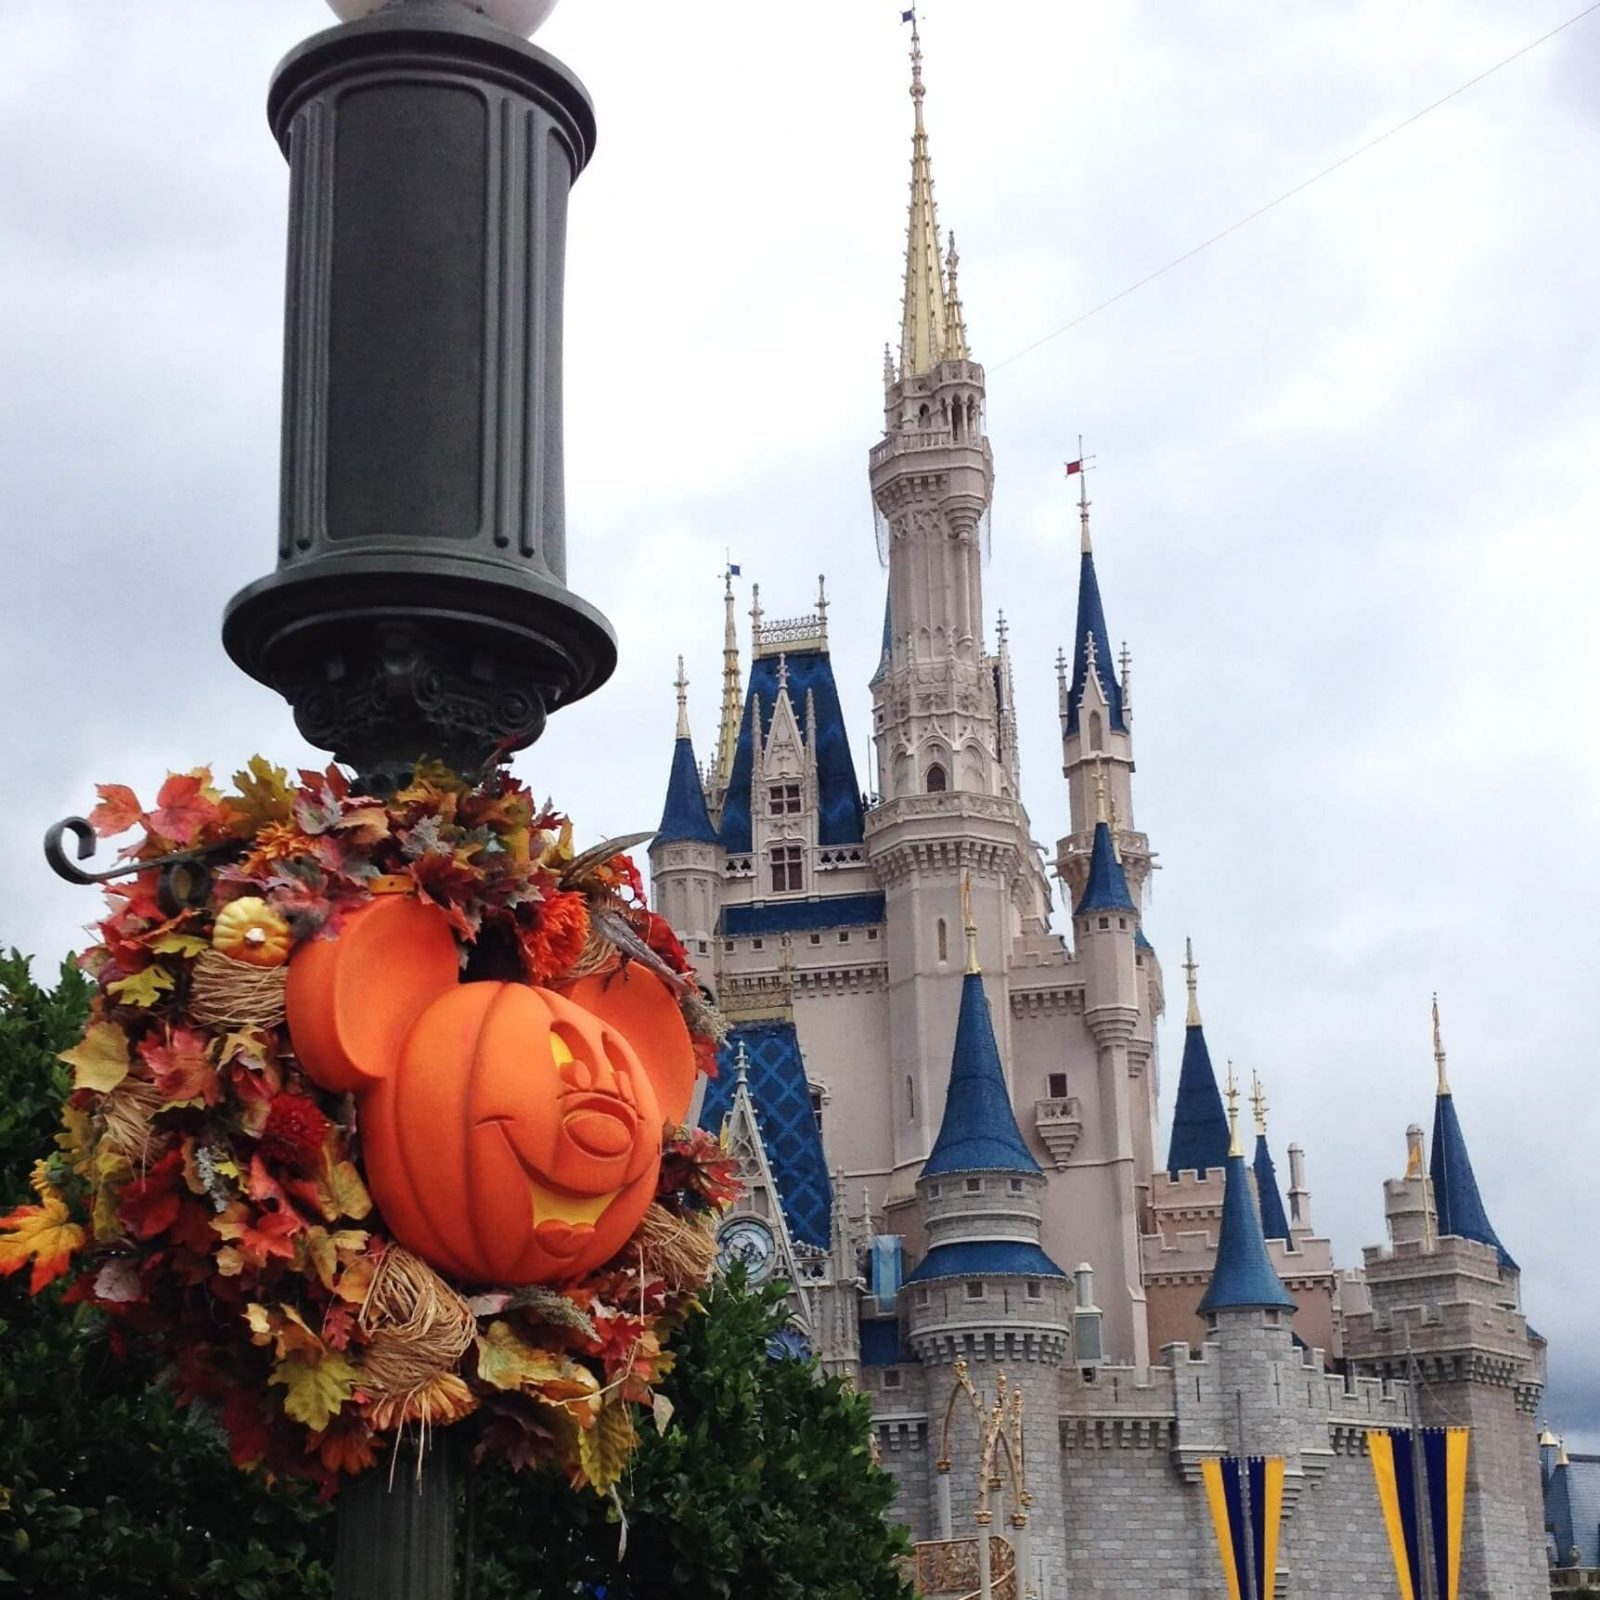 Mickey pumpkin in front of Cinderella's castle